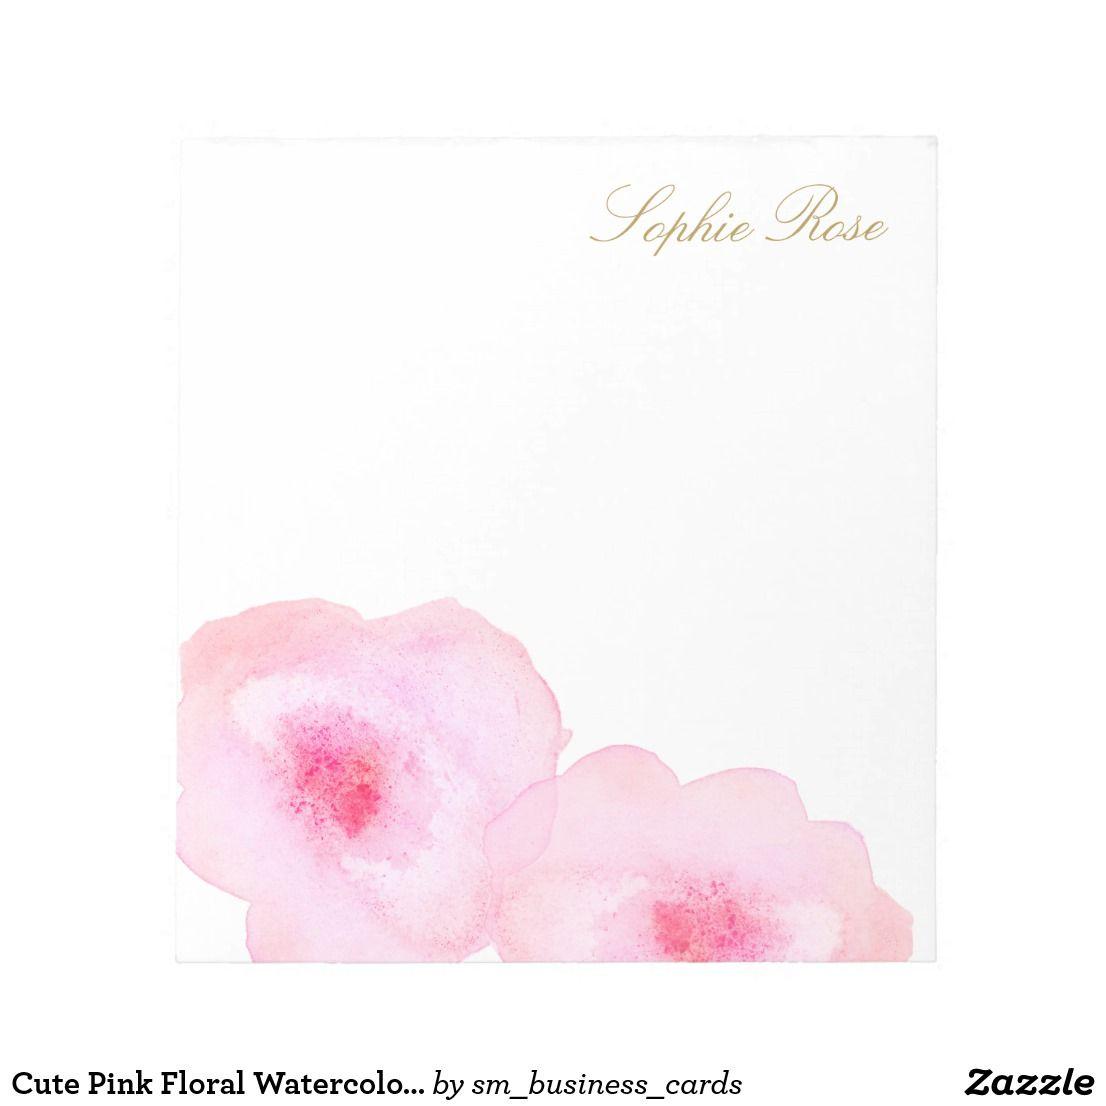 Cute Pink Floral Watercolor Flower Notepad Zazzle Com